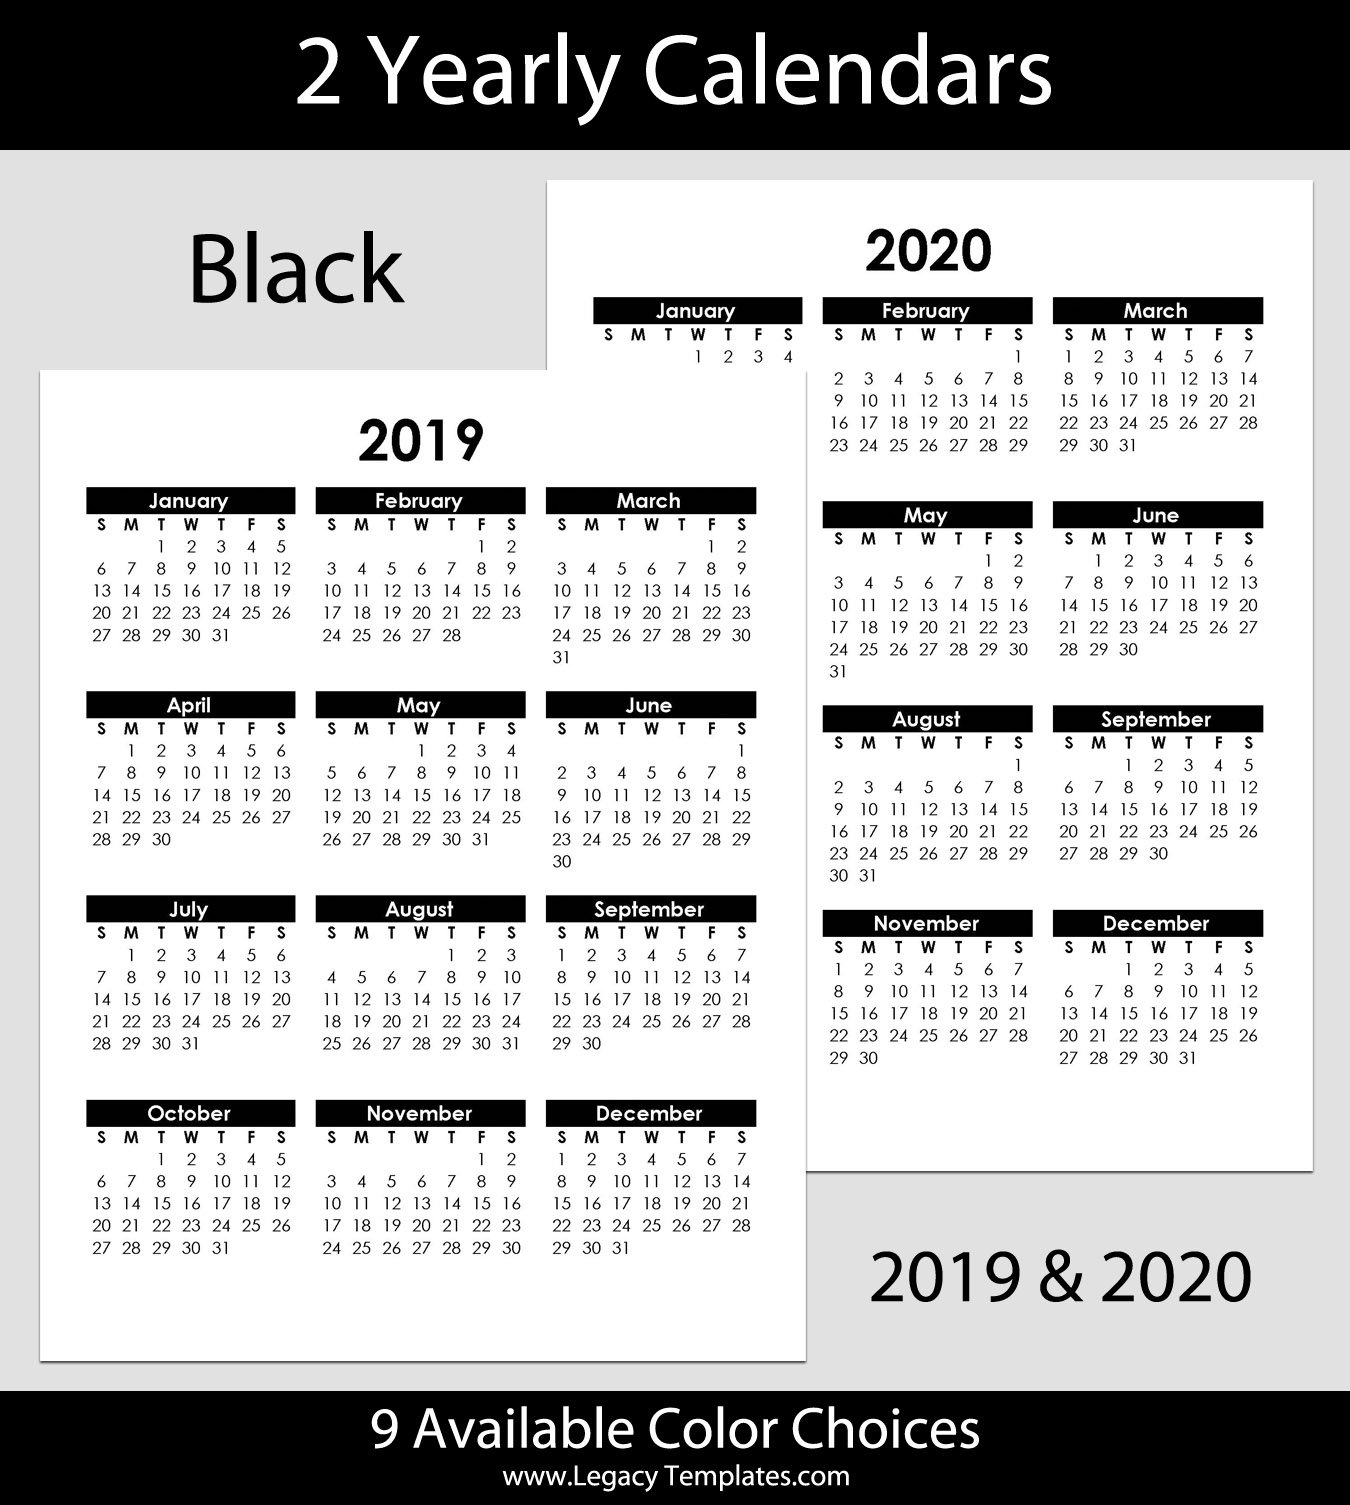 2019 & 2020 Yearly Calendar - 8.5 X 11   Legacy Templates Free Printable 8 X 11 May Calendar